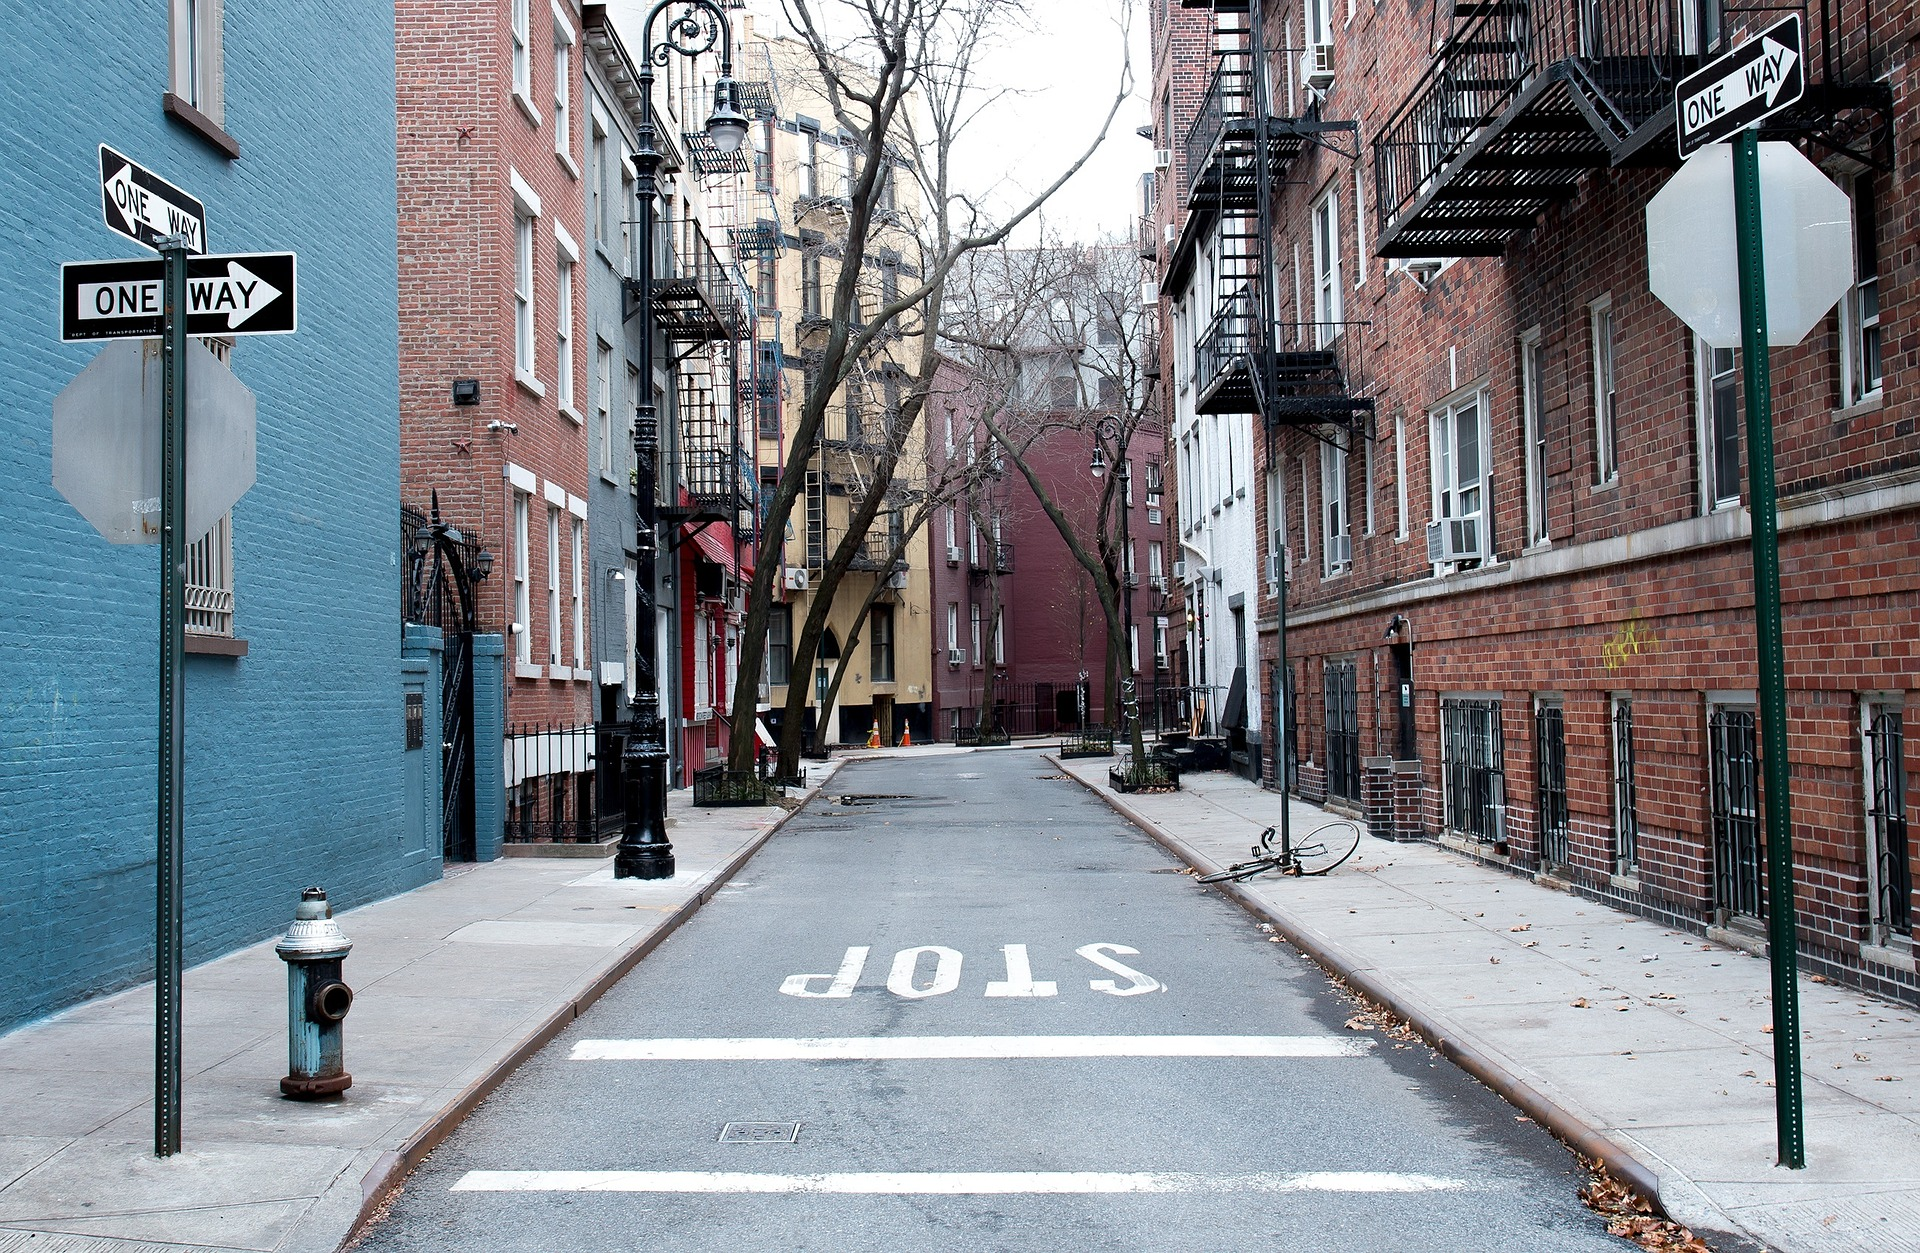 one-way-1209485_1920.jpg